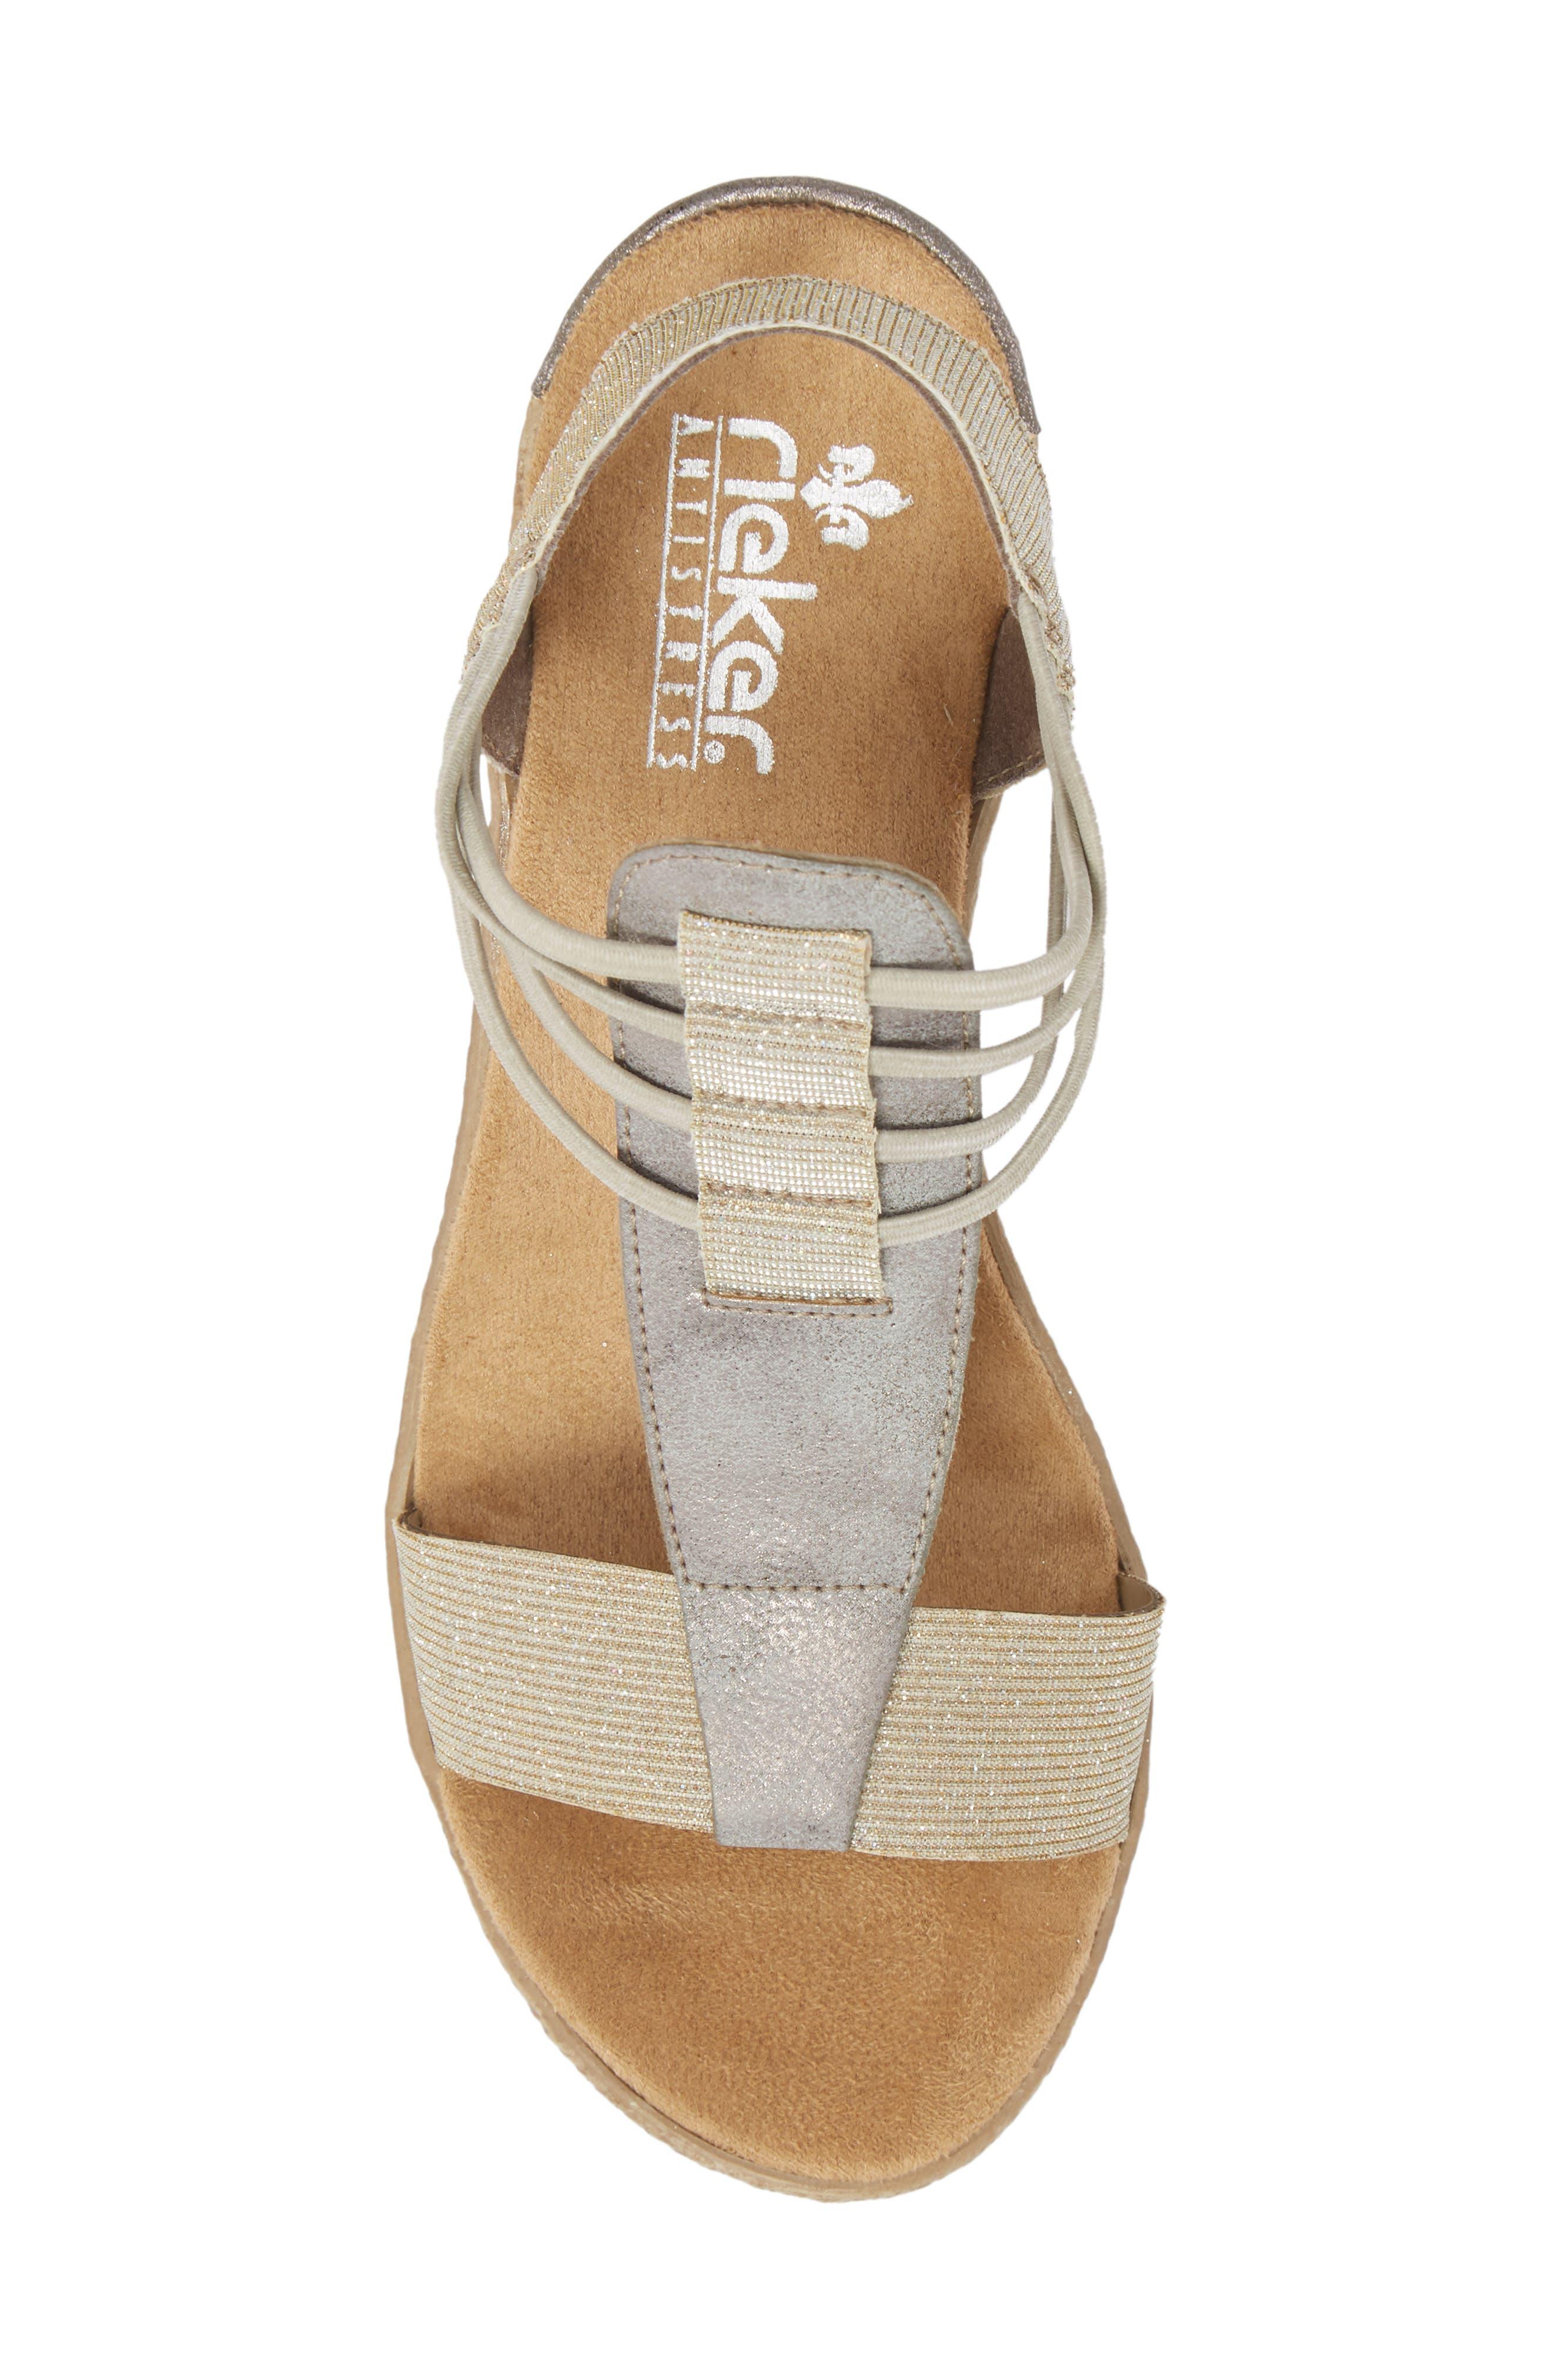 Fanni 22 Espadrille Wedge Sandal,                             Alternate thumbnail 5, color,                             Light Gold/ Grey Fabric